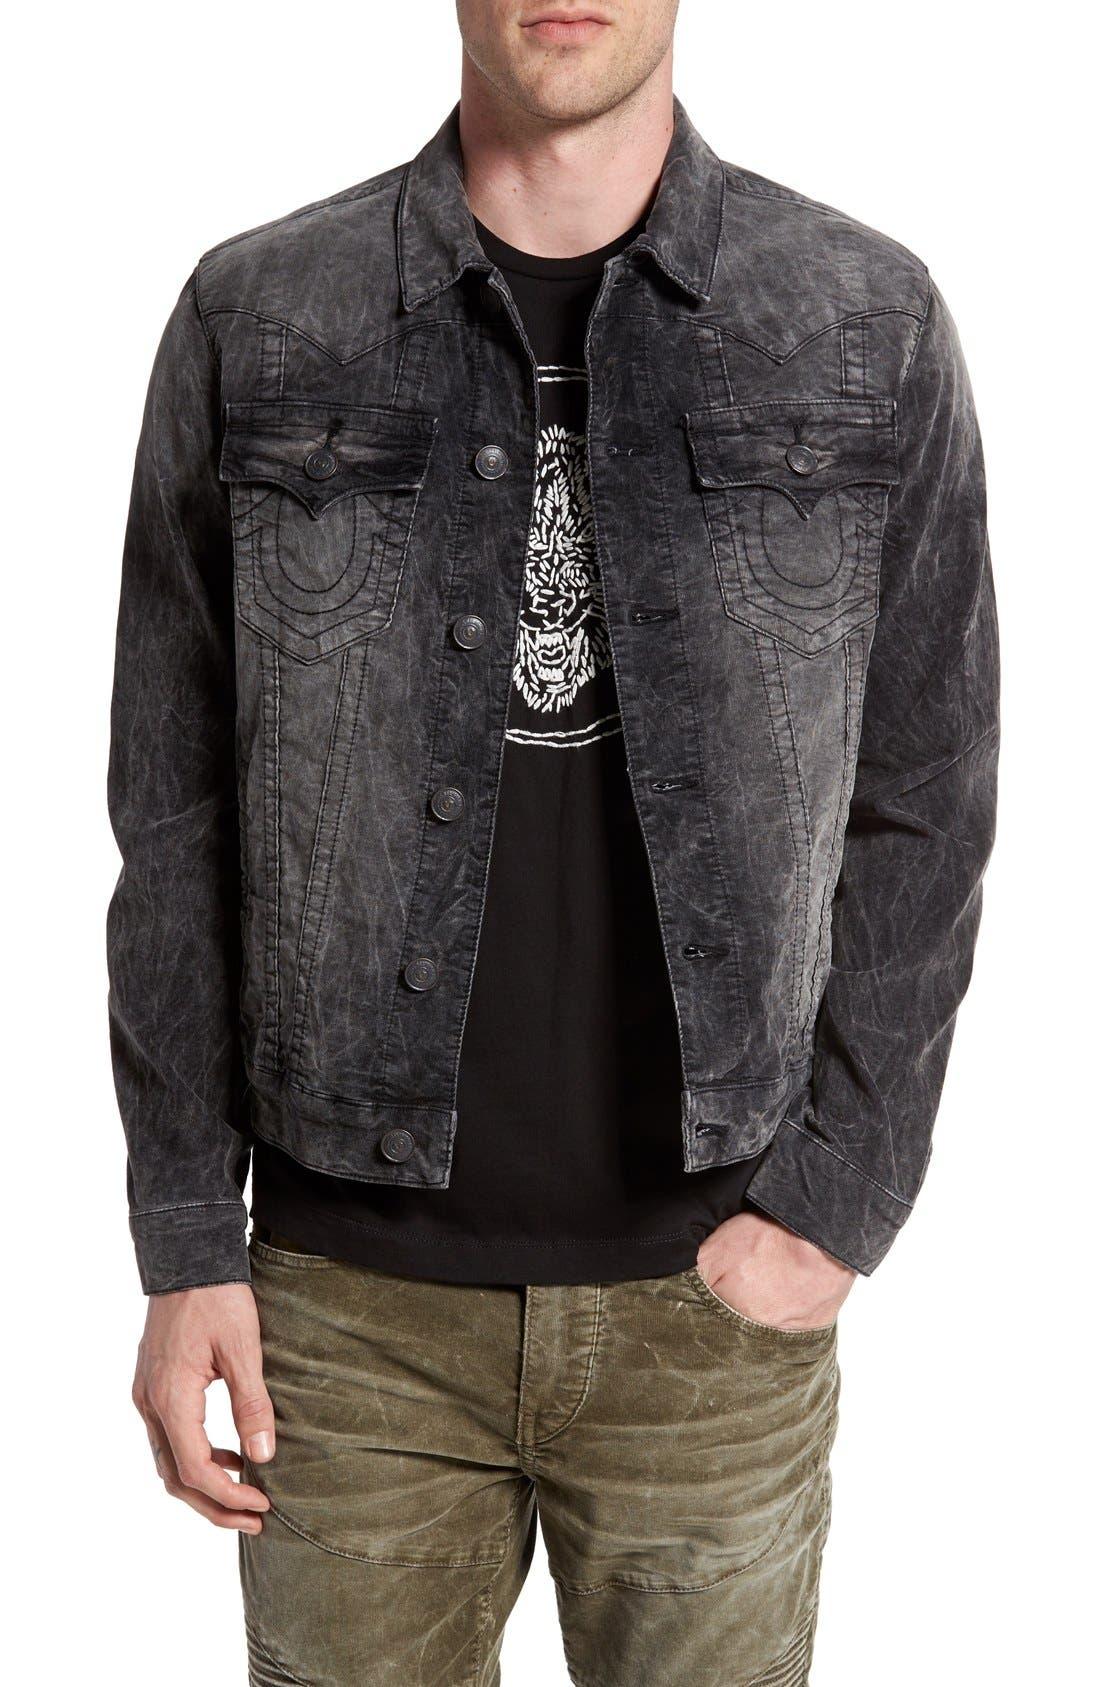 Alternate Image 1 Selected - True Religion Brand Jeans 'Jimmy' Corduroy Western Jacket